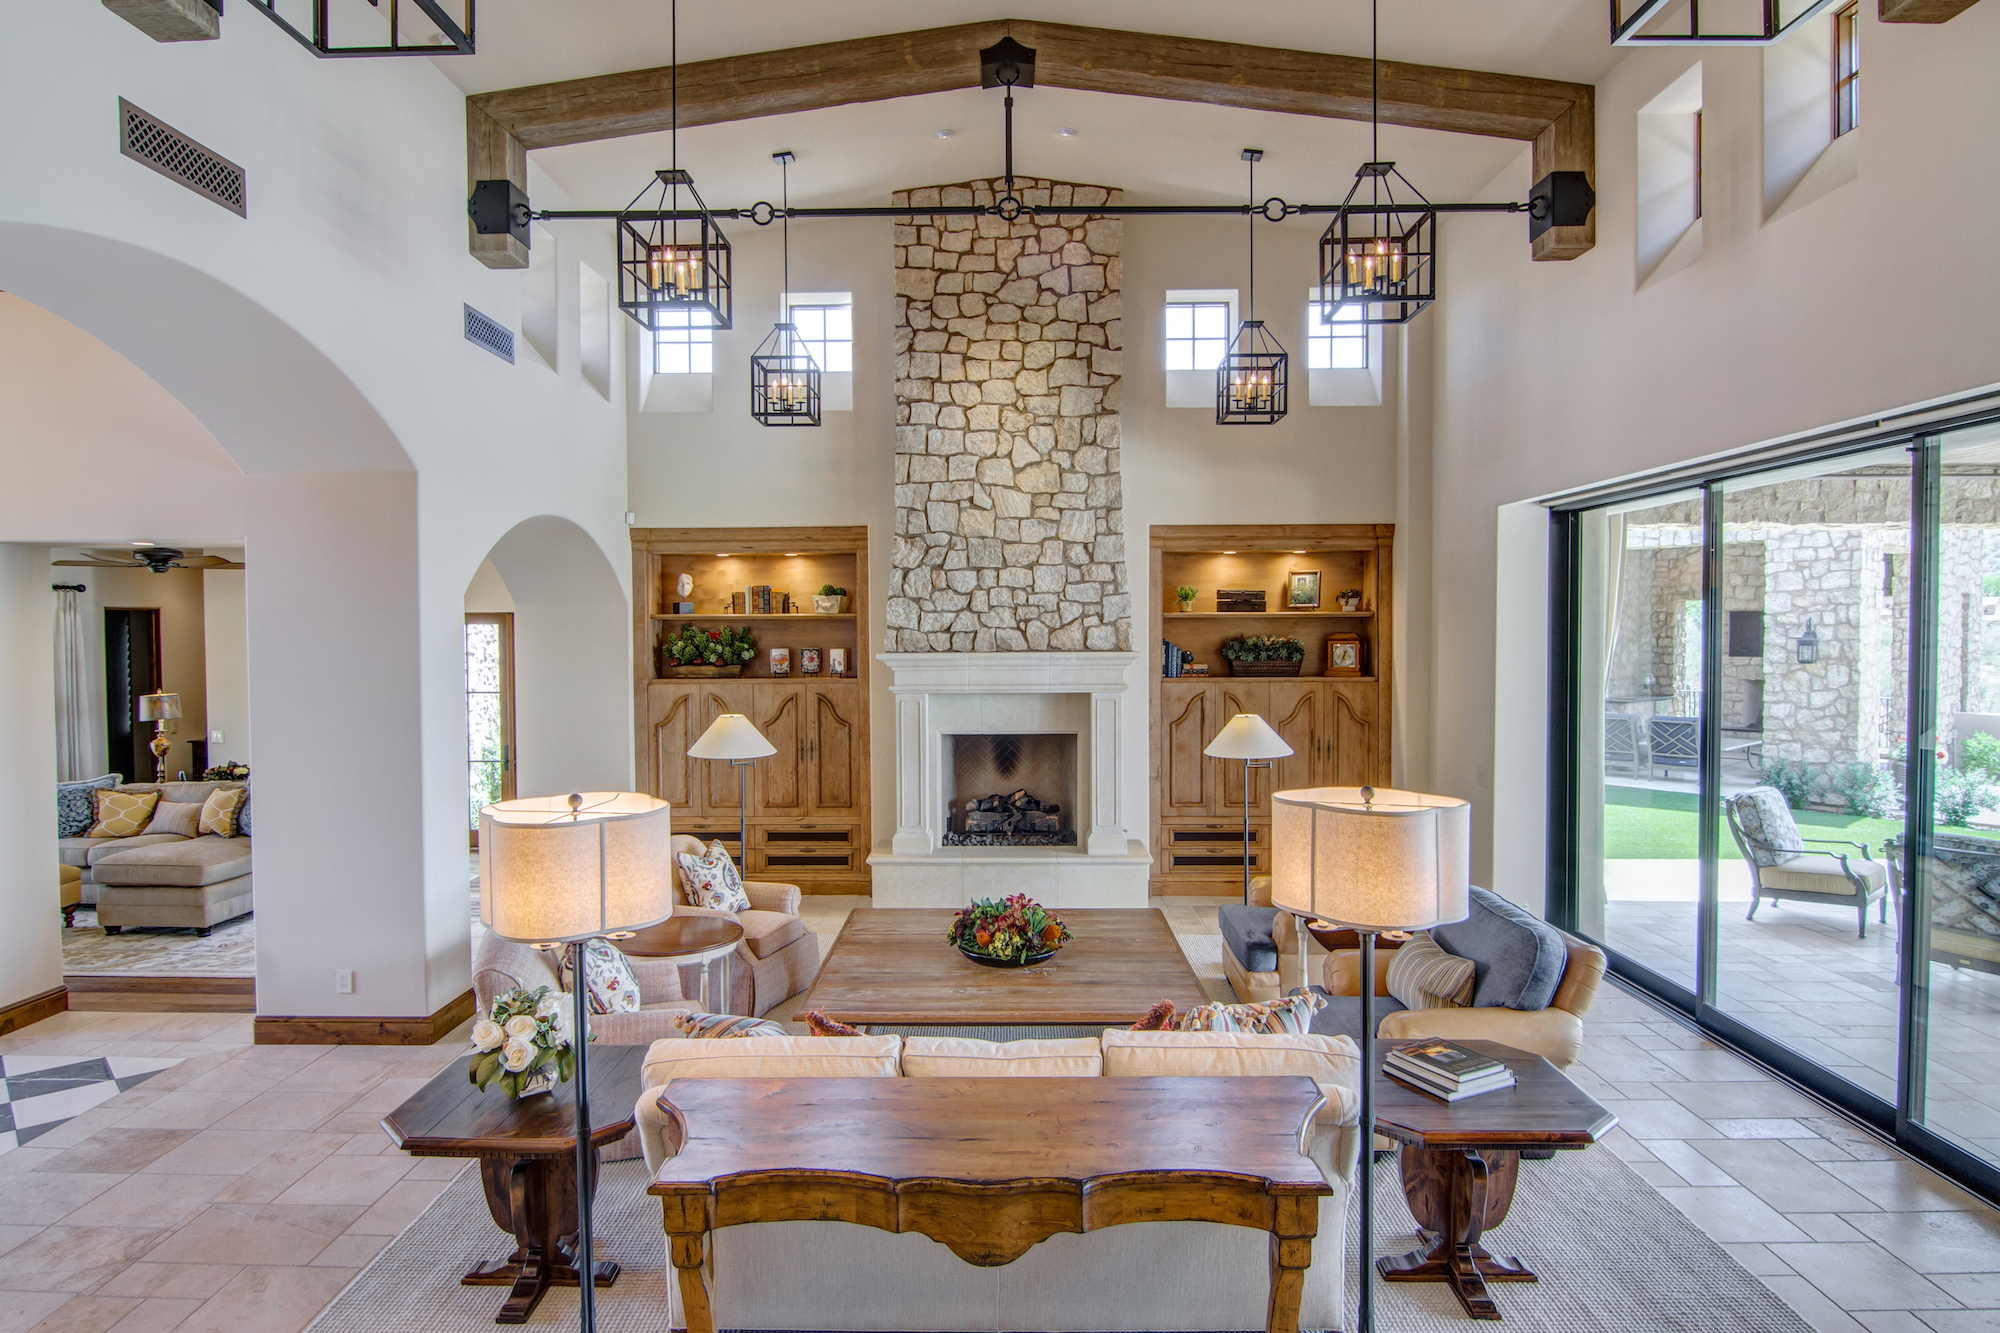 Arizona Great Room interior design by J White Designs